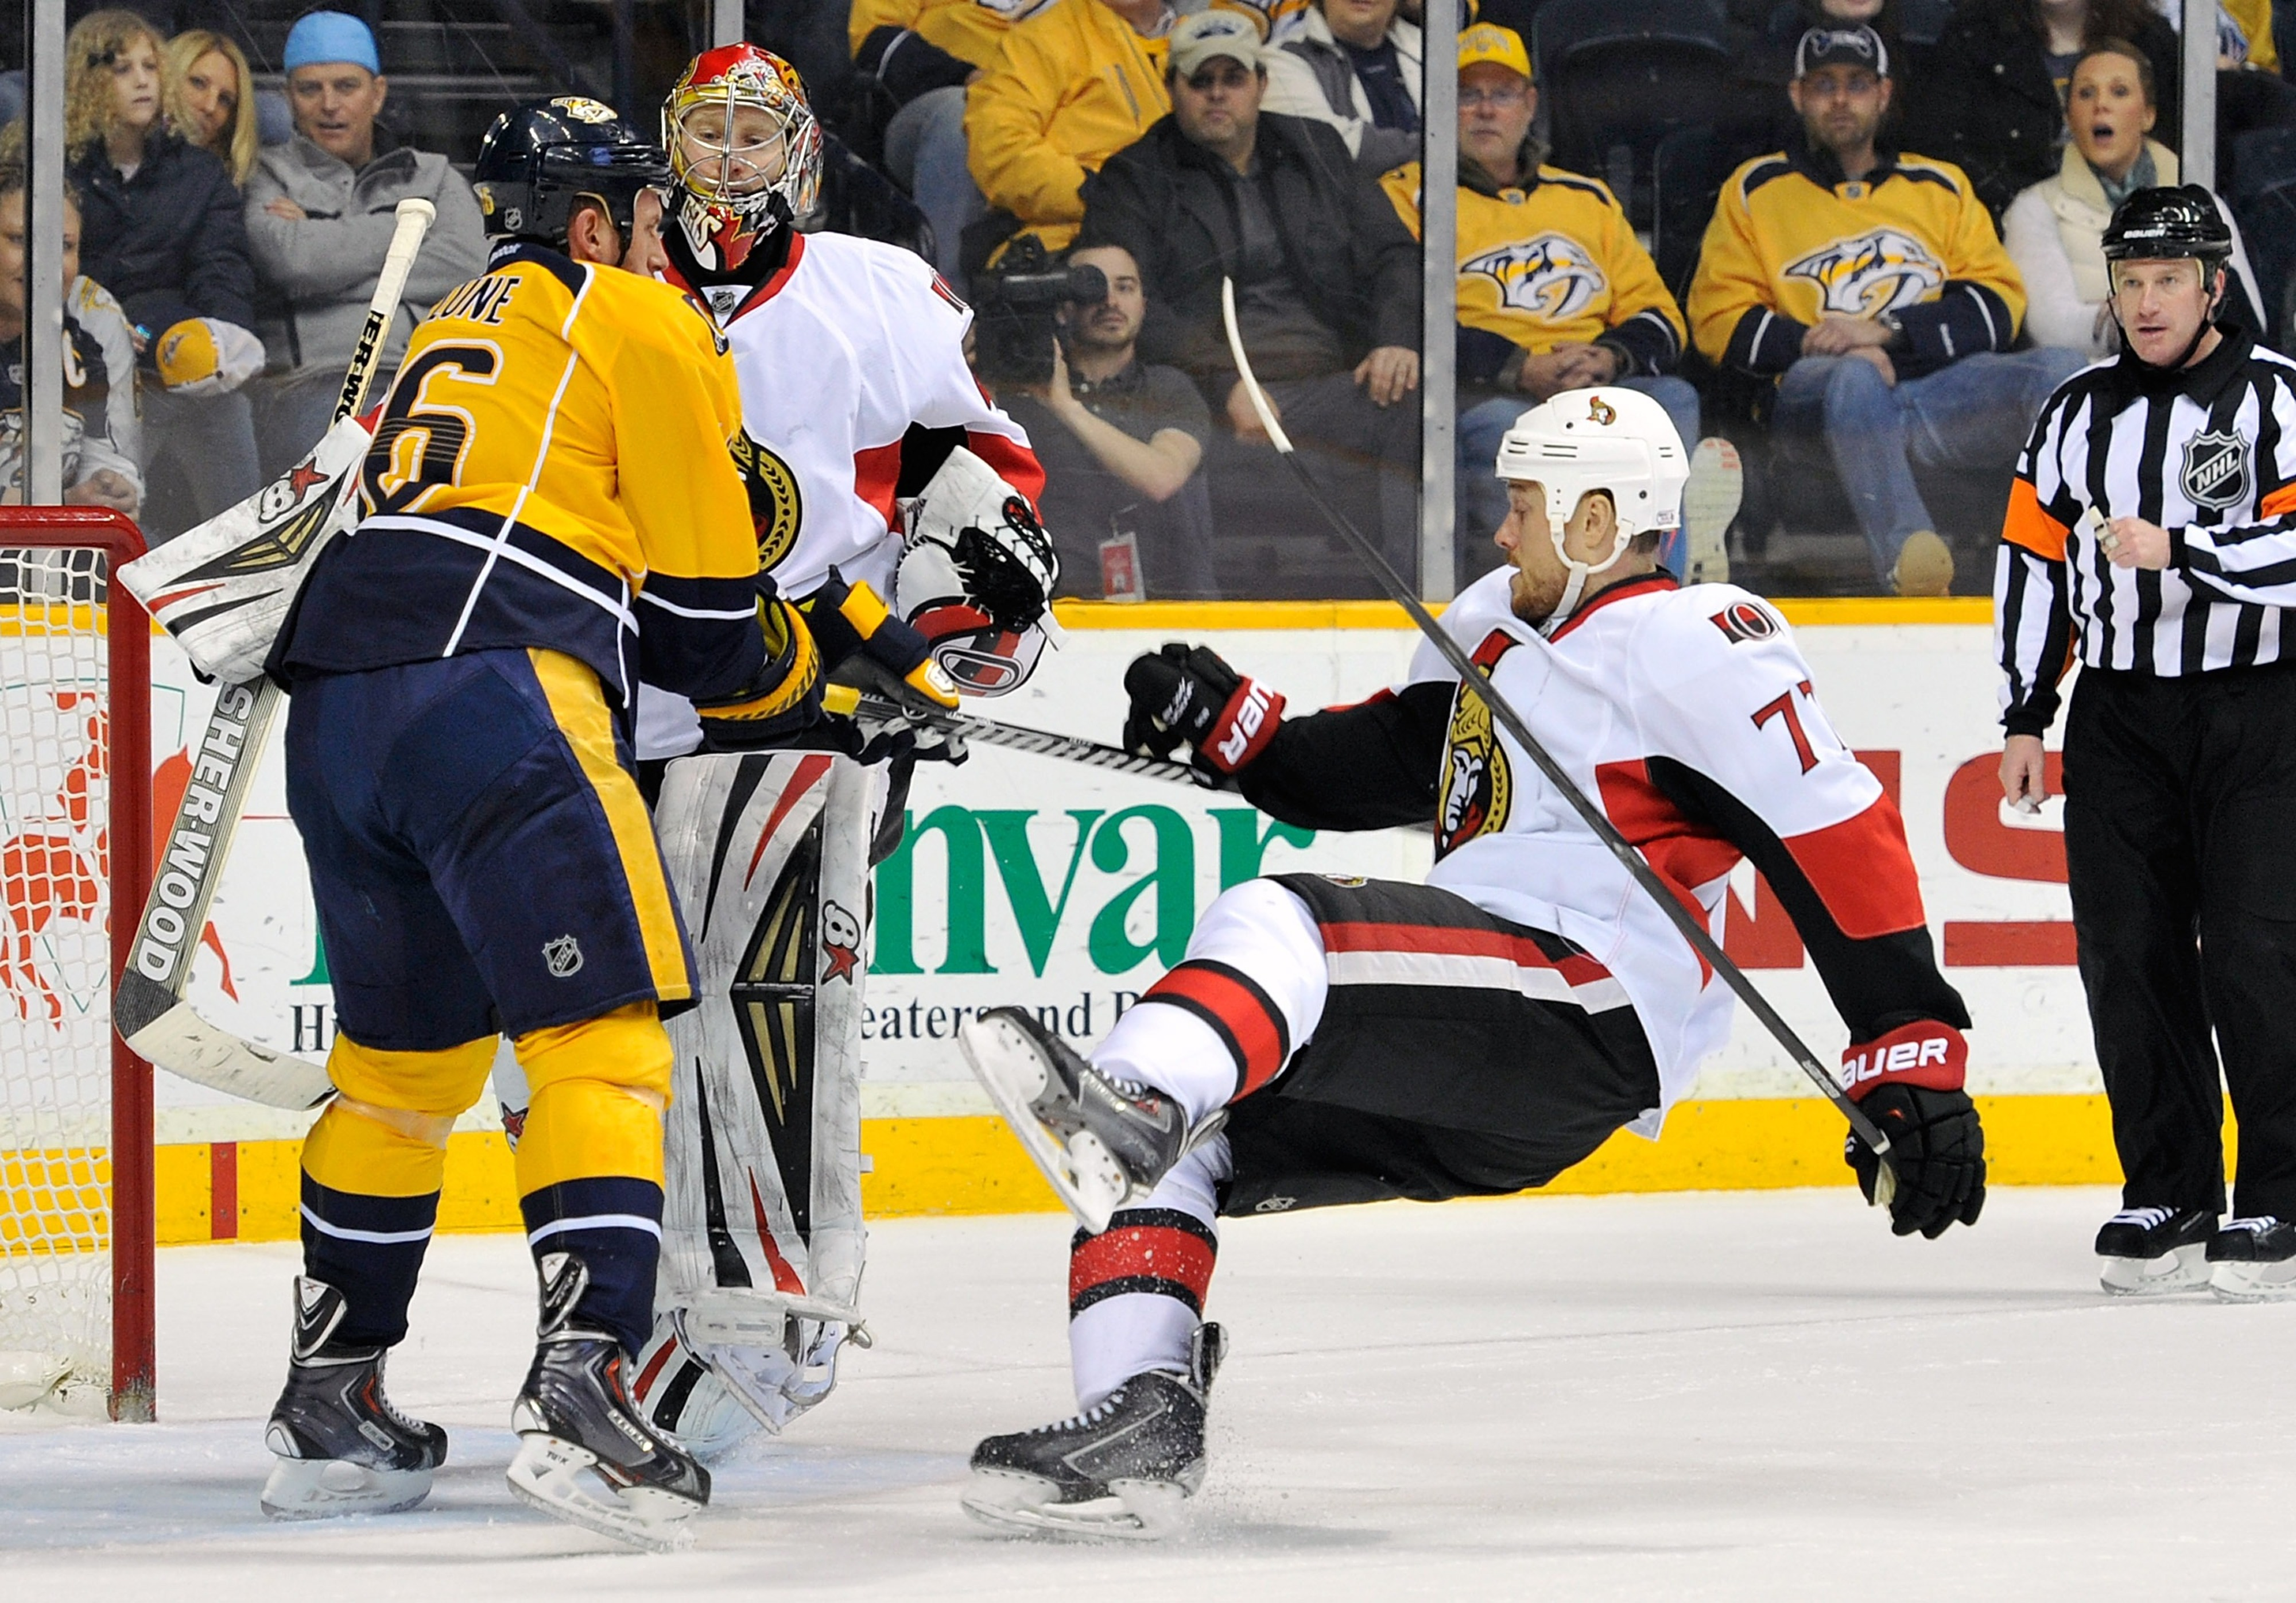 """Oh, hi there Mr. Corvo, I think you dropped something, let me help you."" Rich Clune puts Ottawa Senators forward Joe Corvo on his wallet at Bridgestone Arena on January 11, 2014."